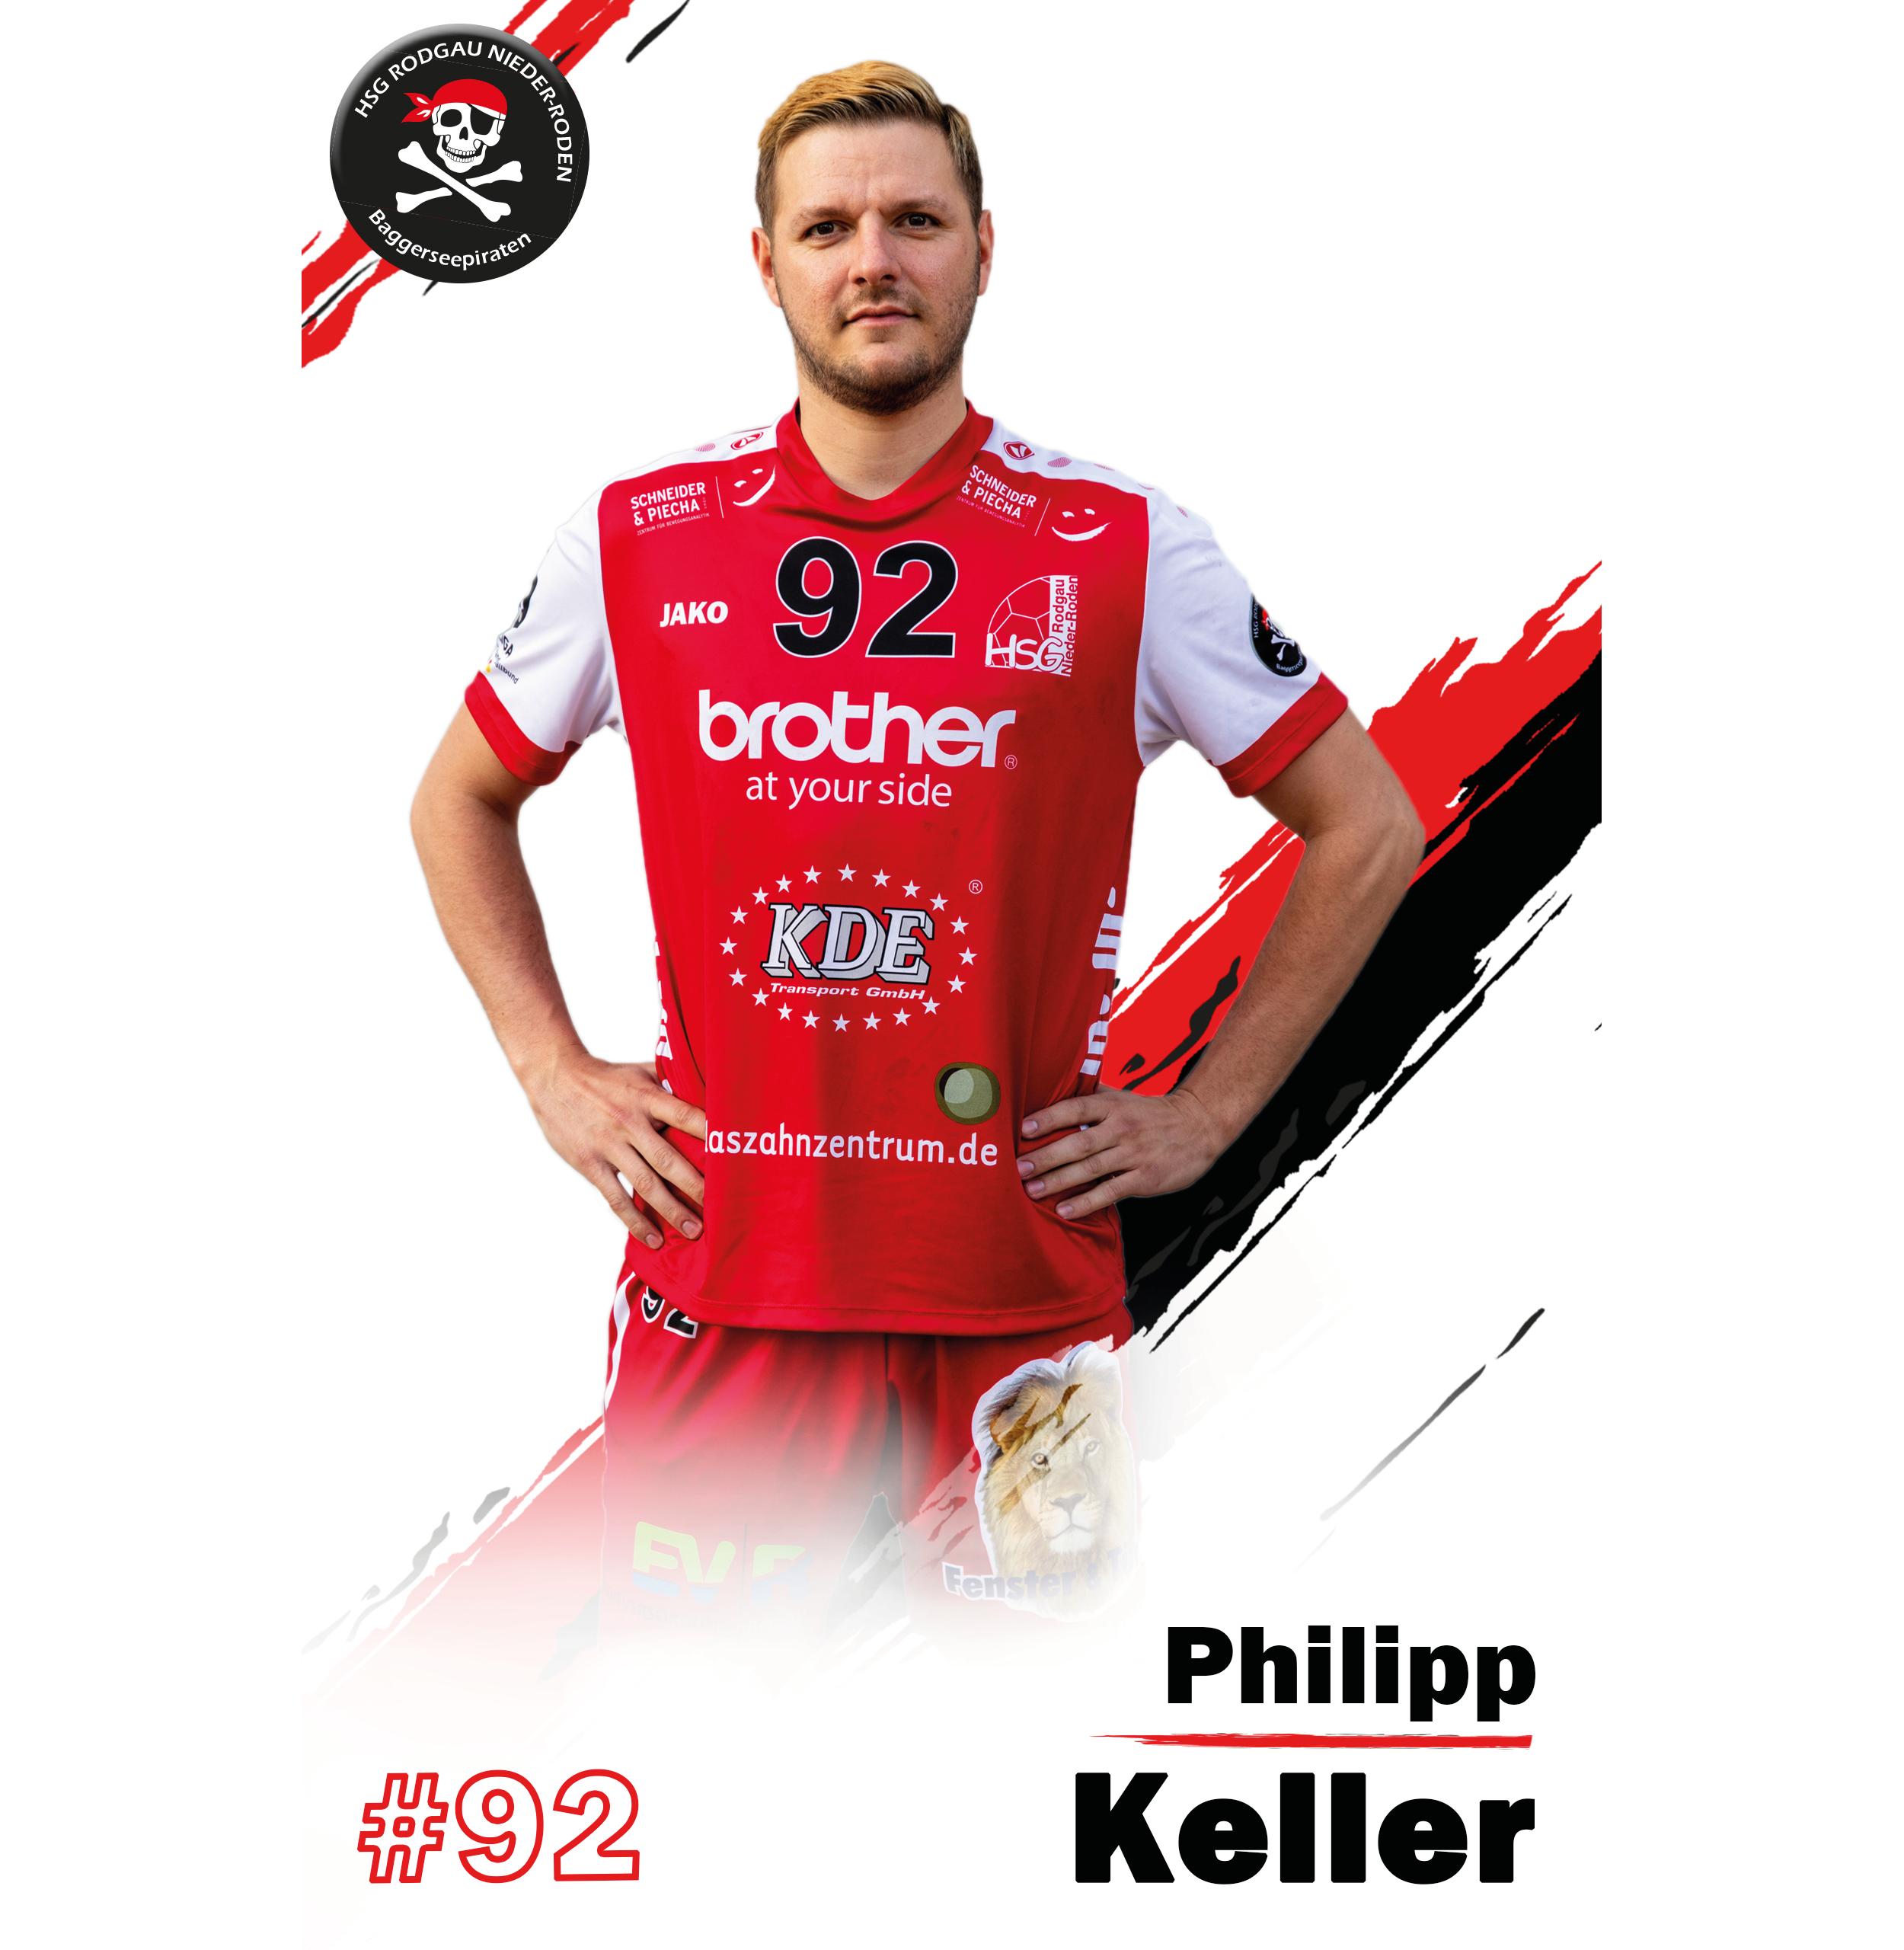 Philipp Keller